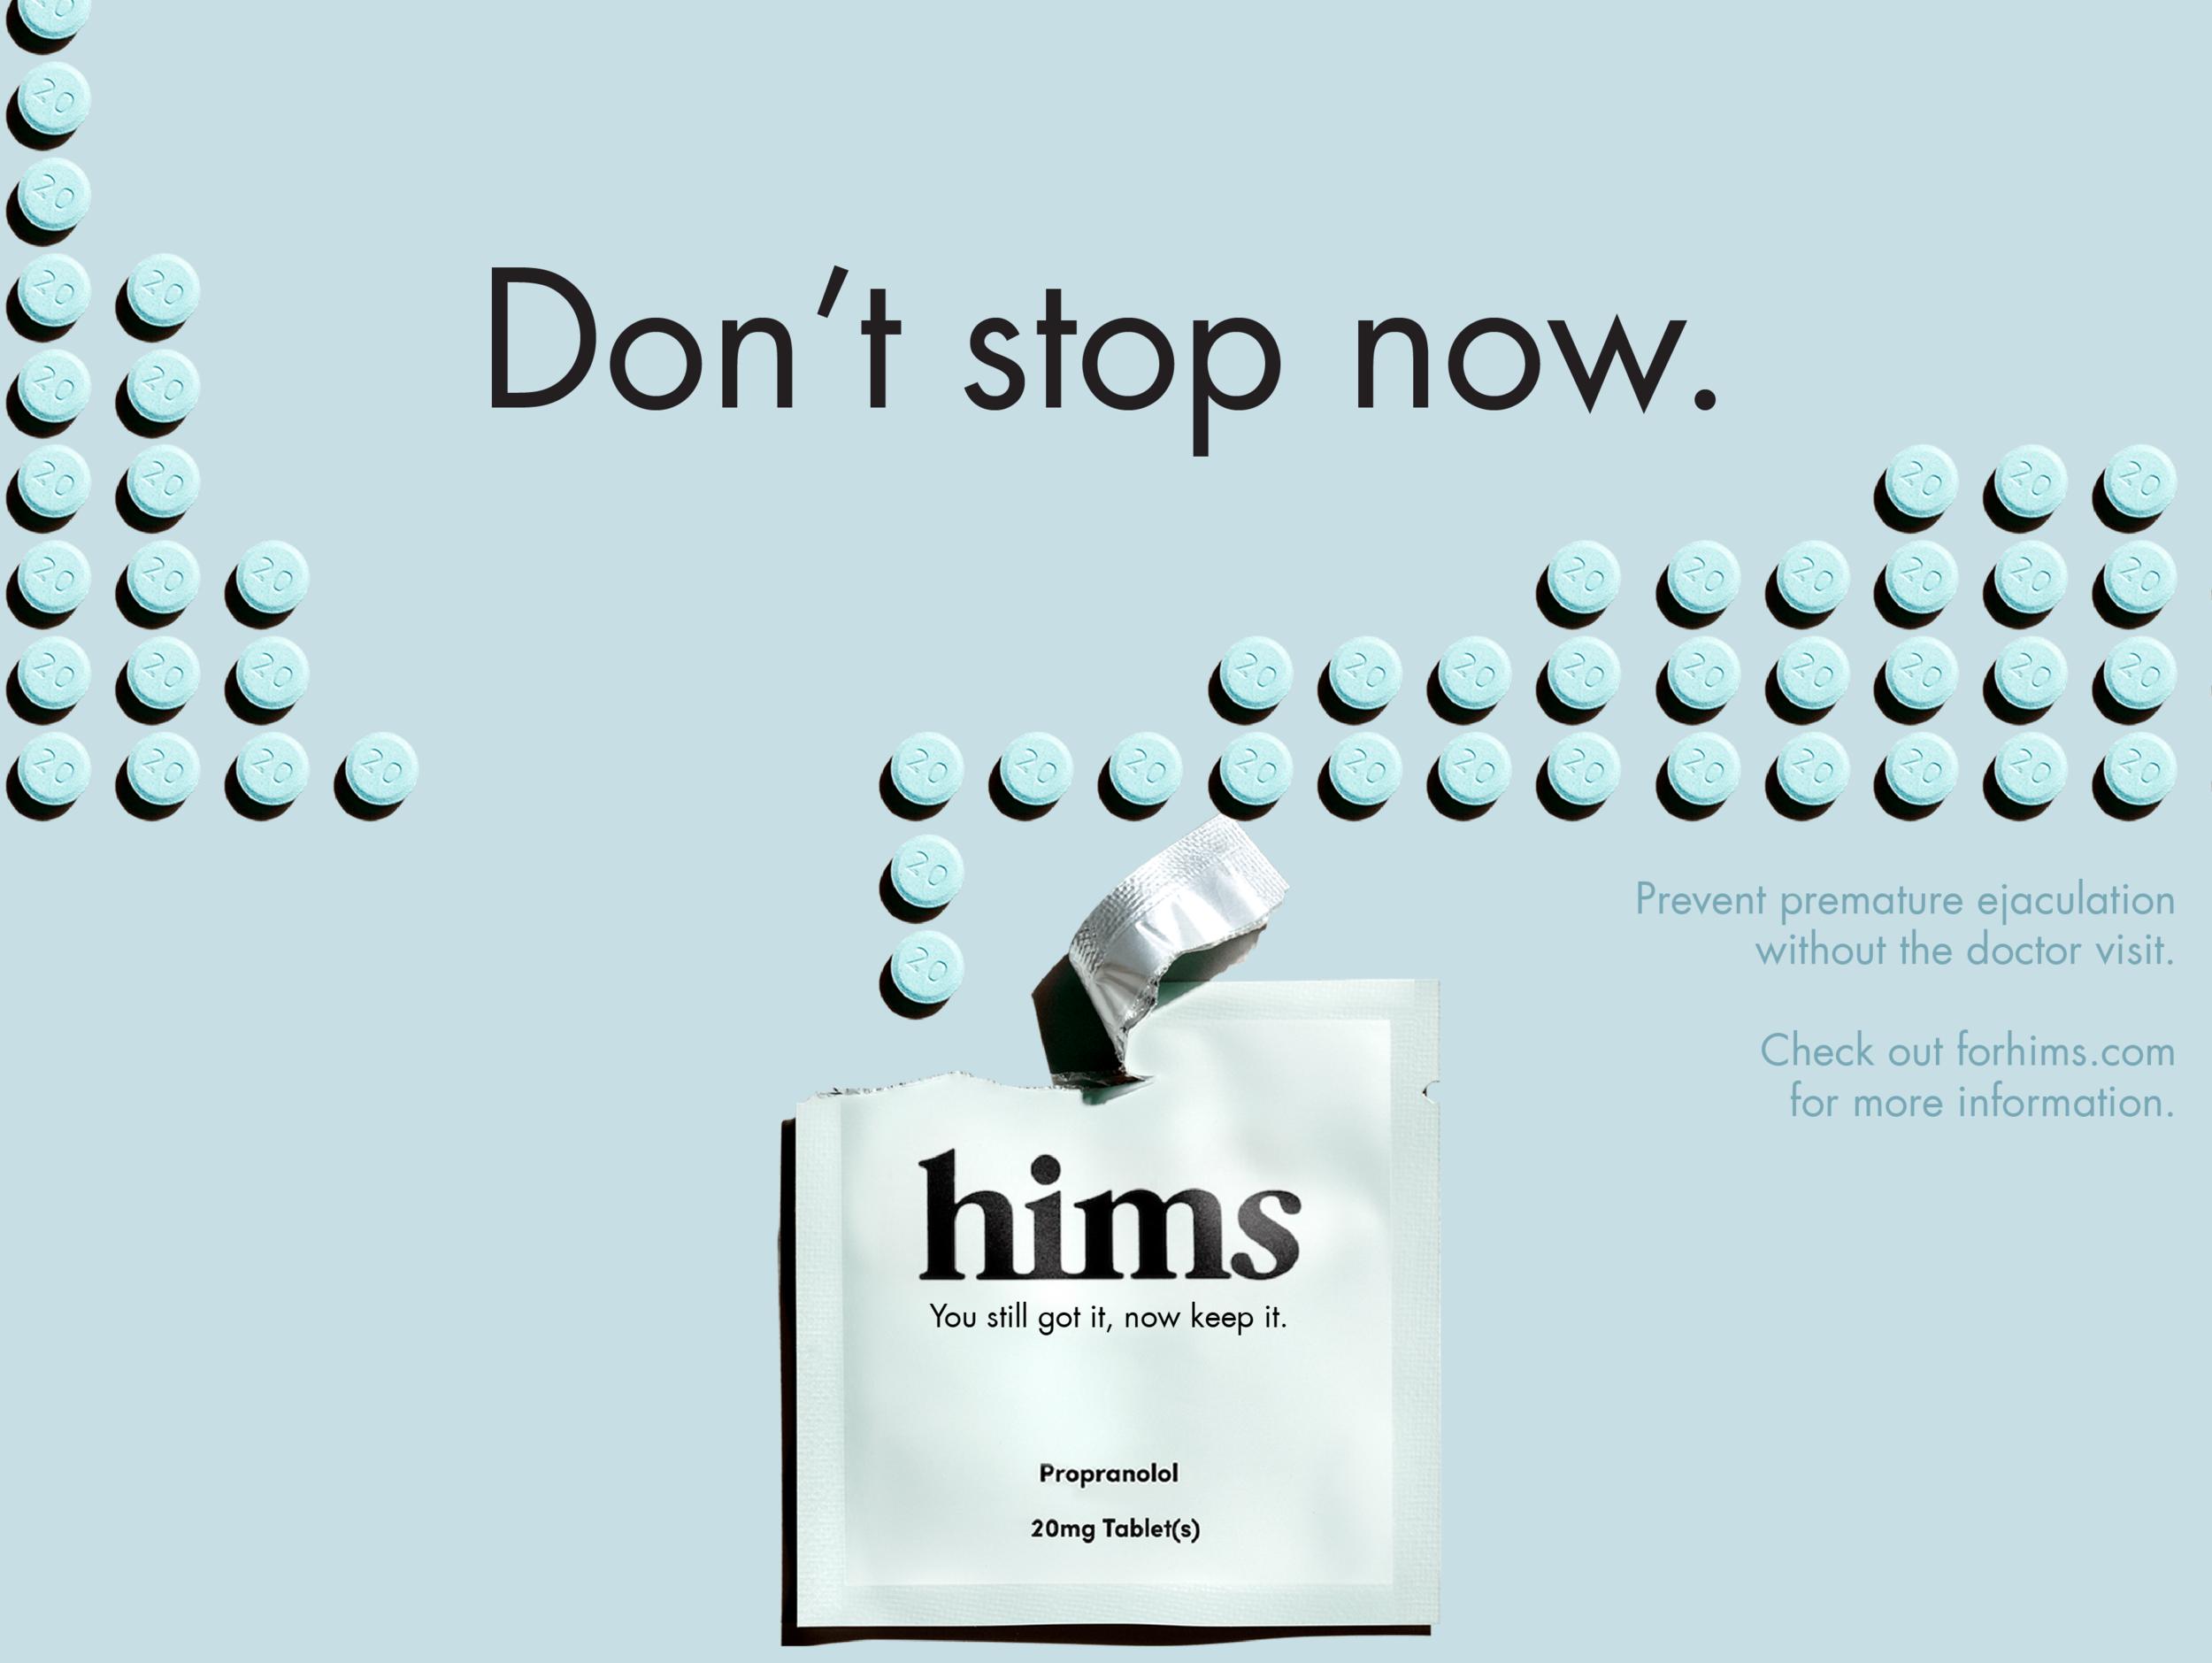 hims_OOH-01.png